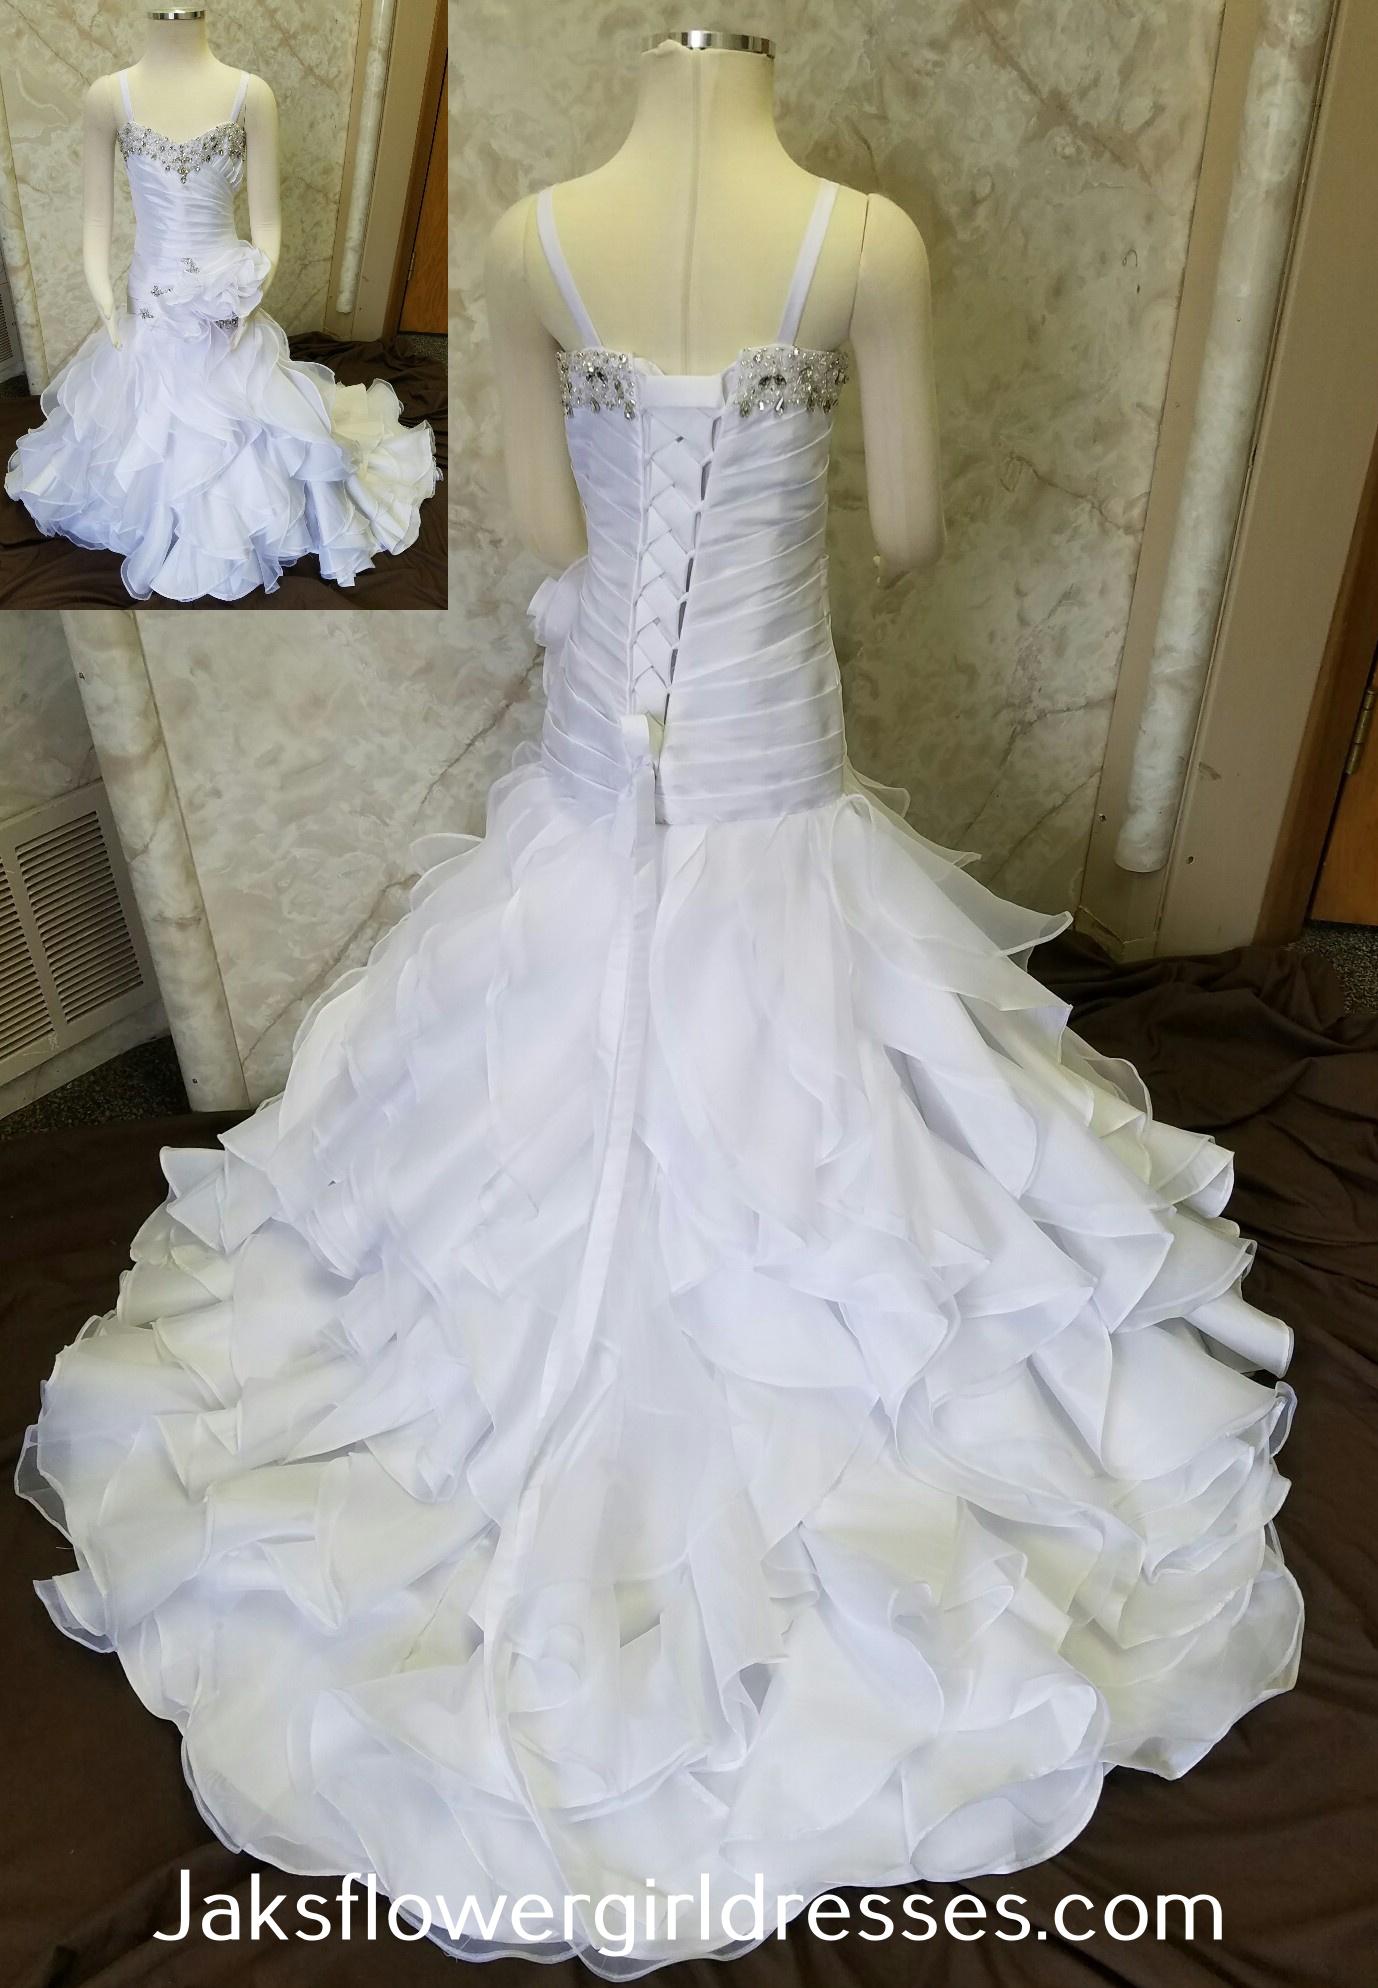 6c7813663a9 Trumpet flower girl dresses. Trumpet mermaid dress with ruffle ...